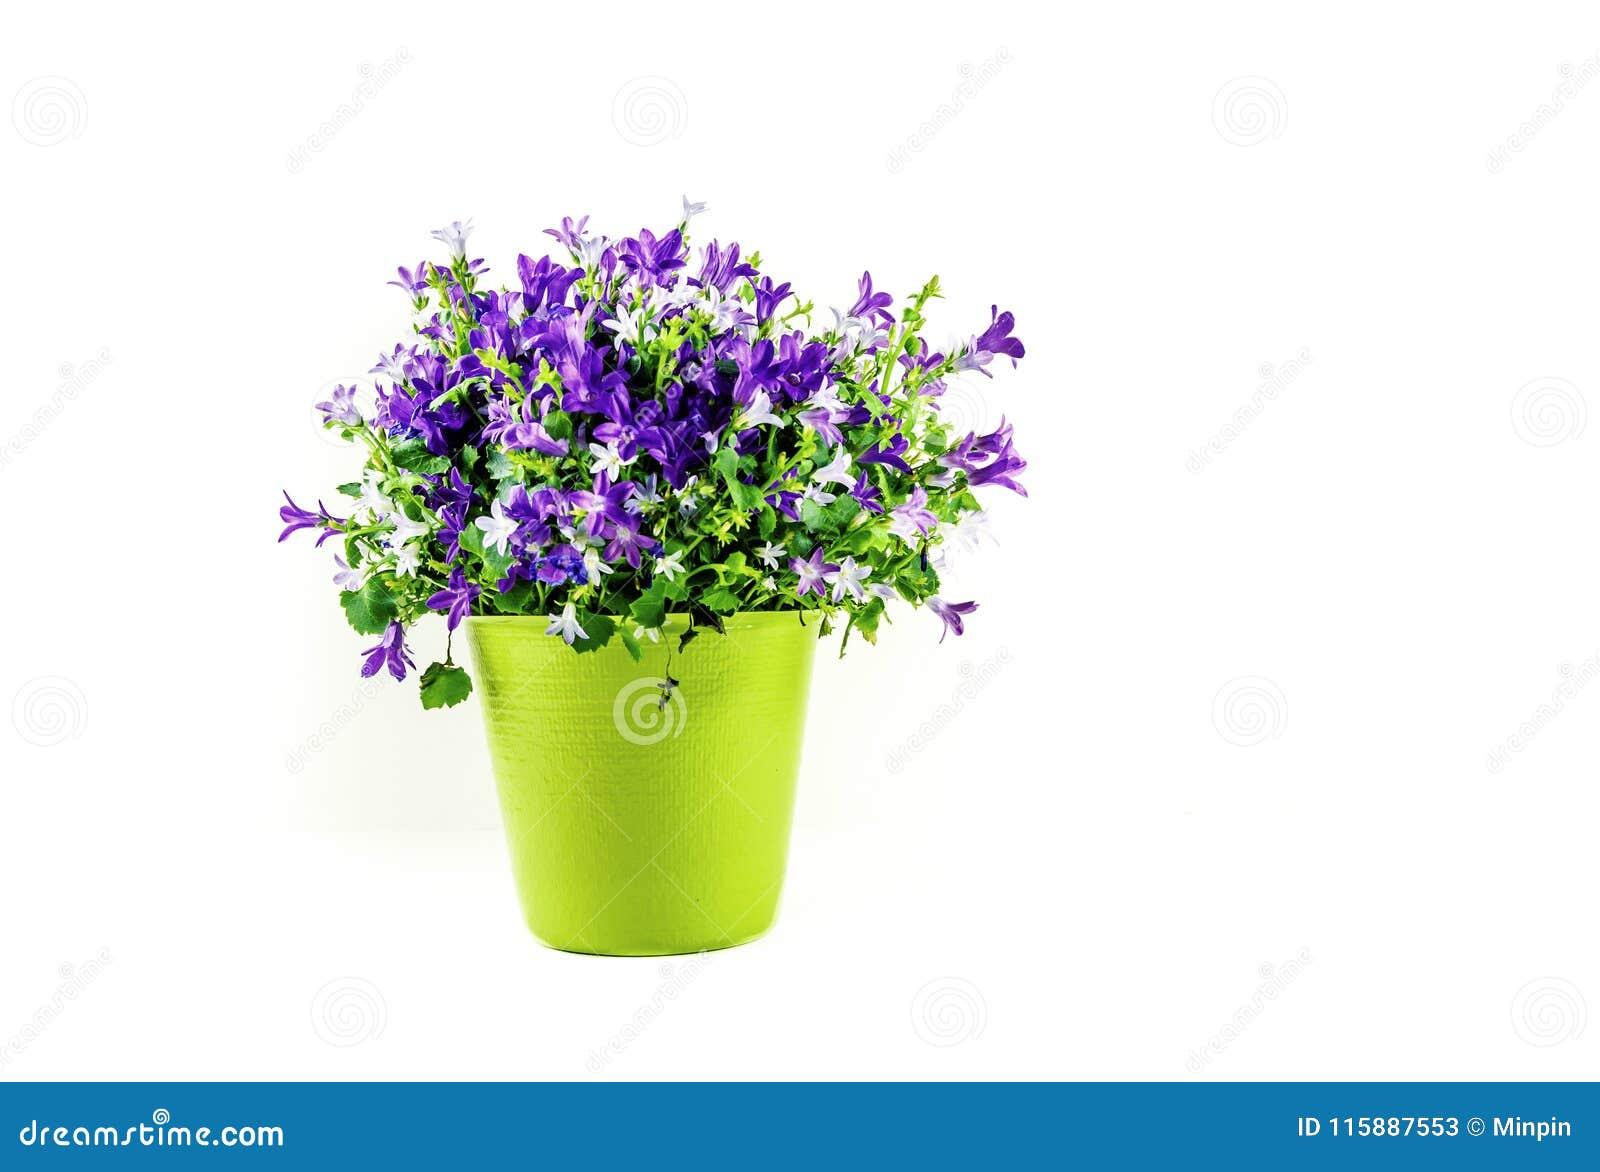 Bloemenregeling in Groene die Vaas op Witte Achtergrond wordt geïsoleerd -